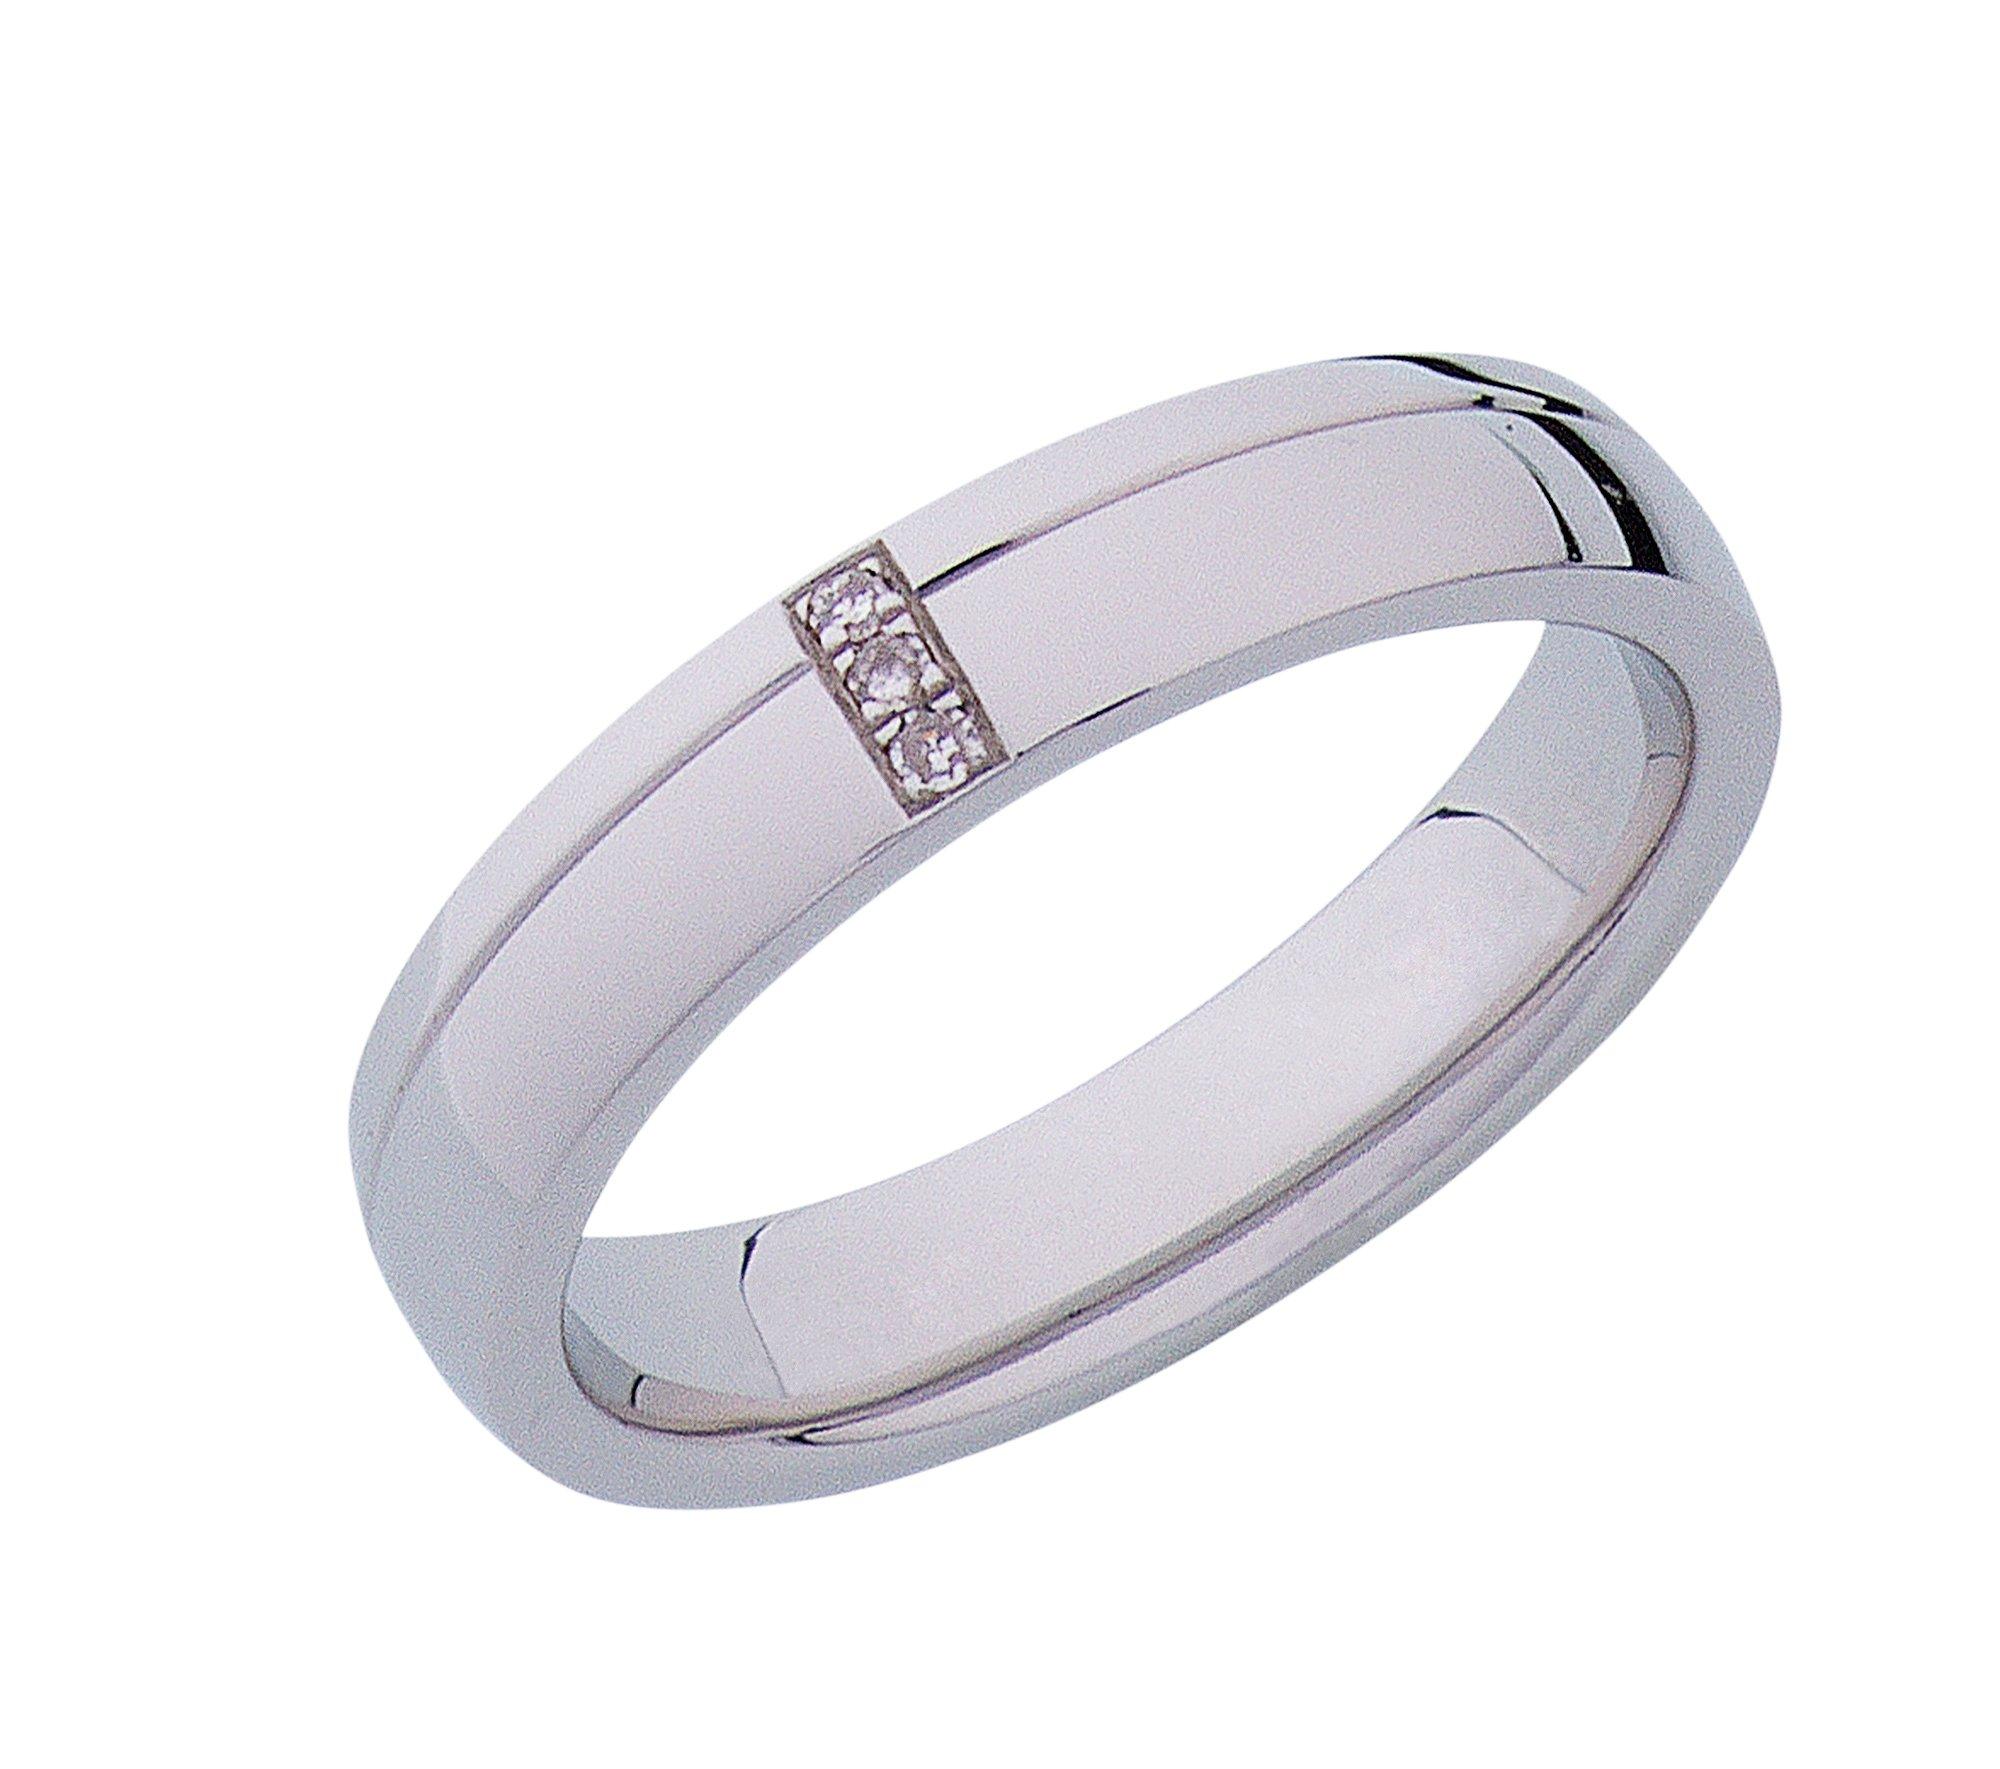 Mens wedding rings argos uk clearance